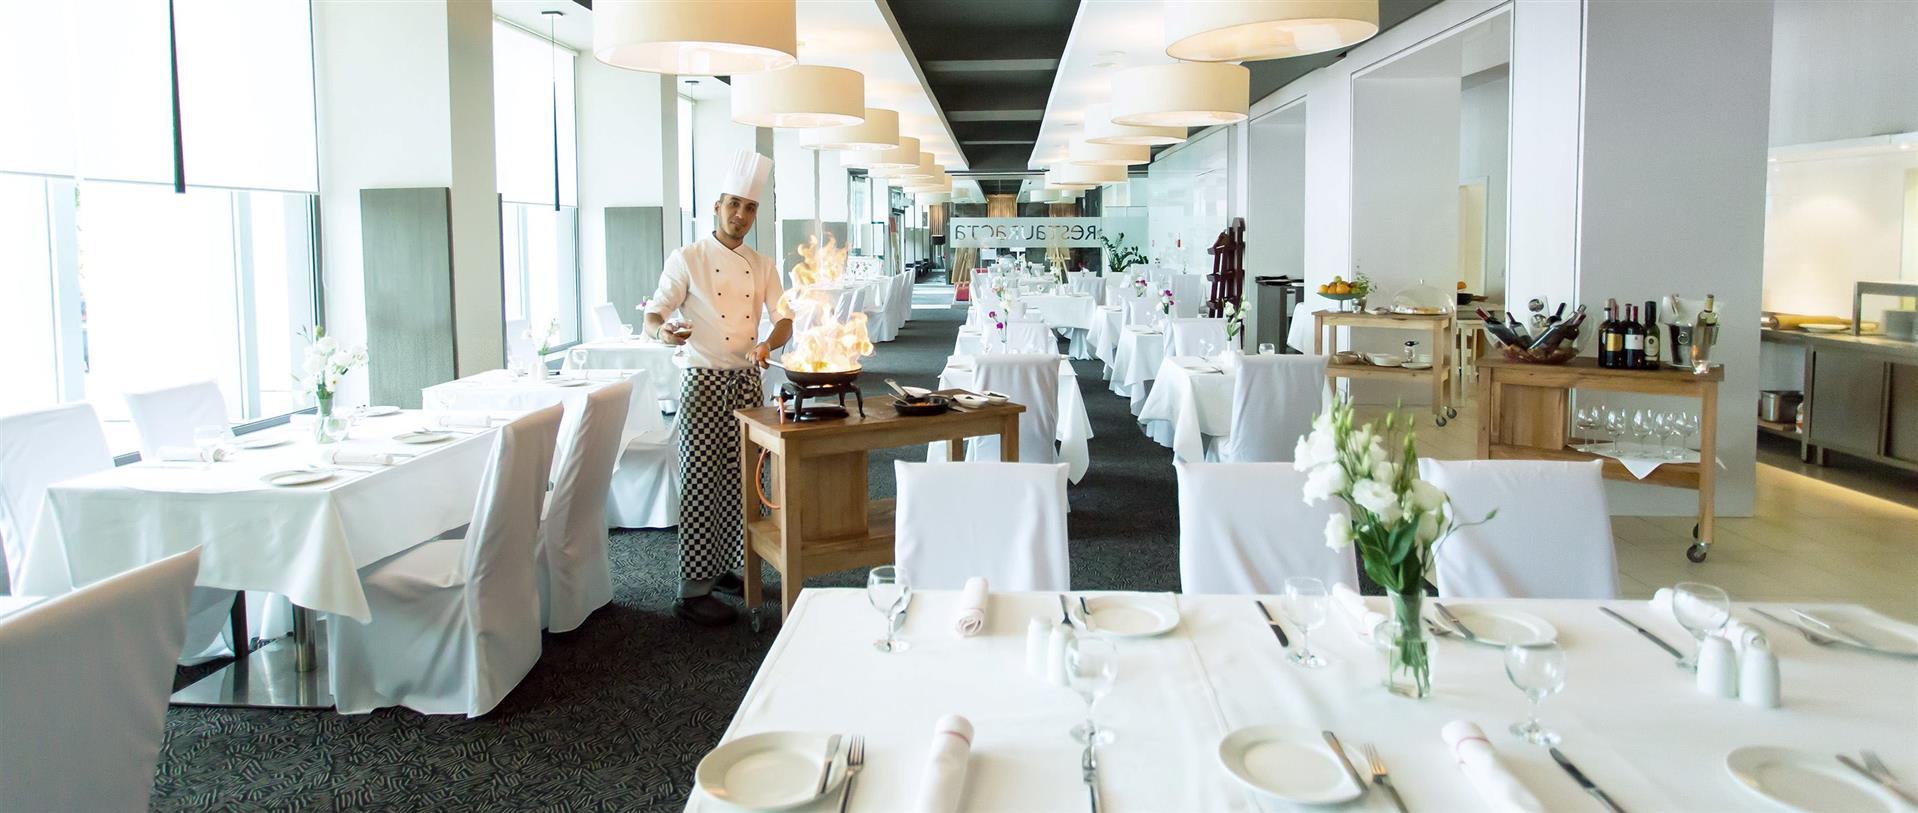 Restauracja Kuchnia Otwarta Hotel Park Inn By Radisson Kato